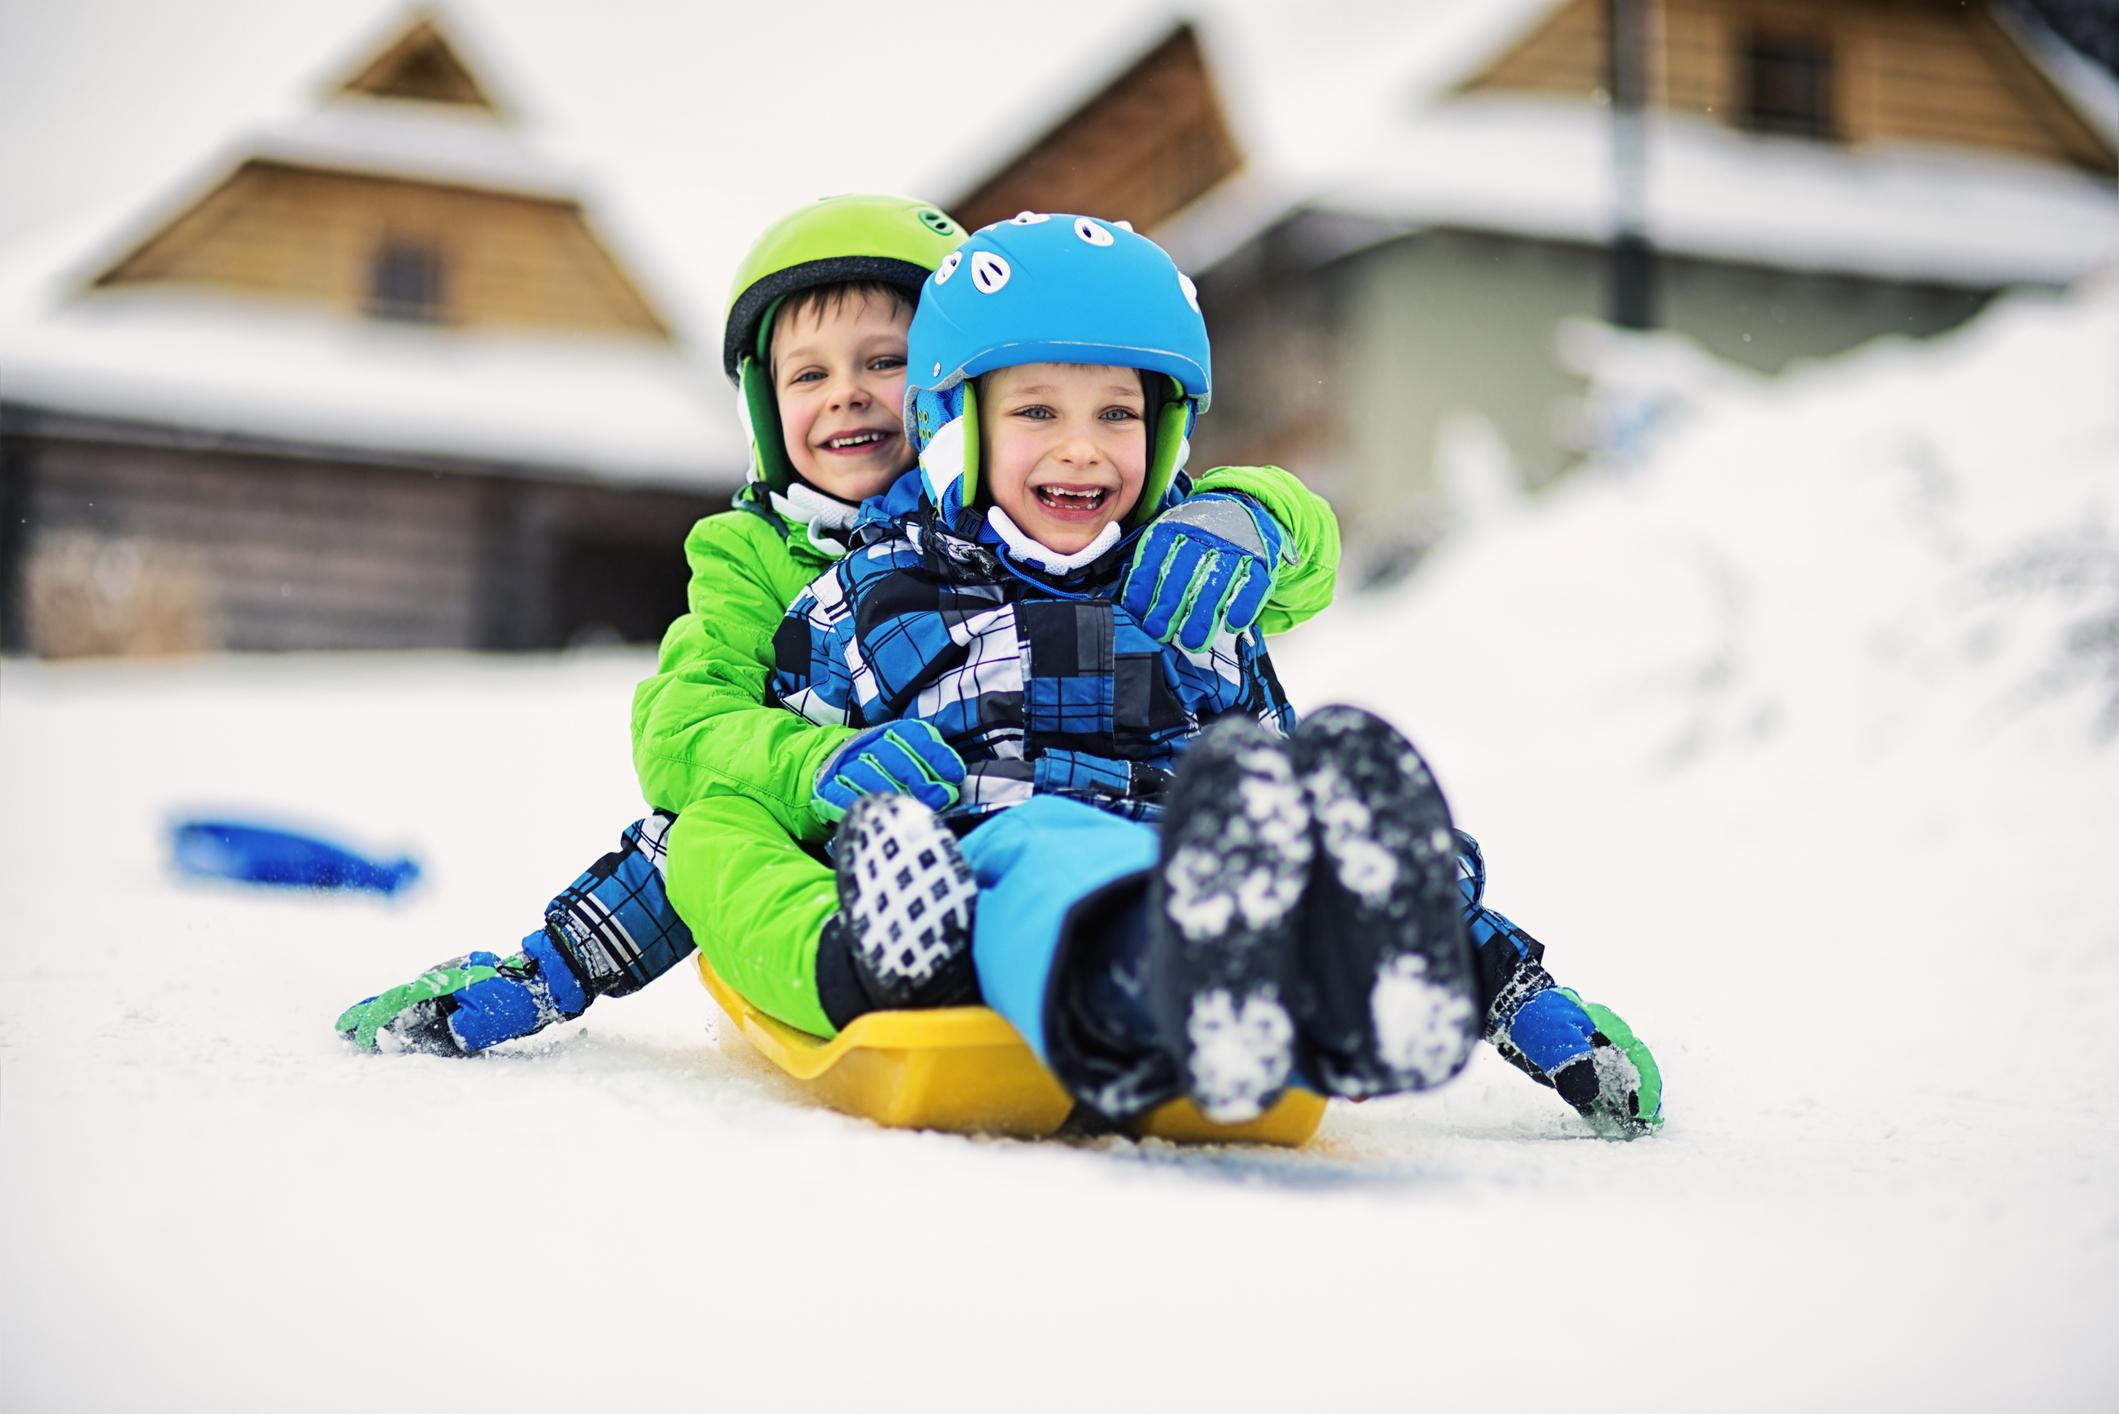 Little boys sliding on sled in winter with helmets